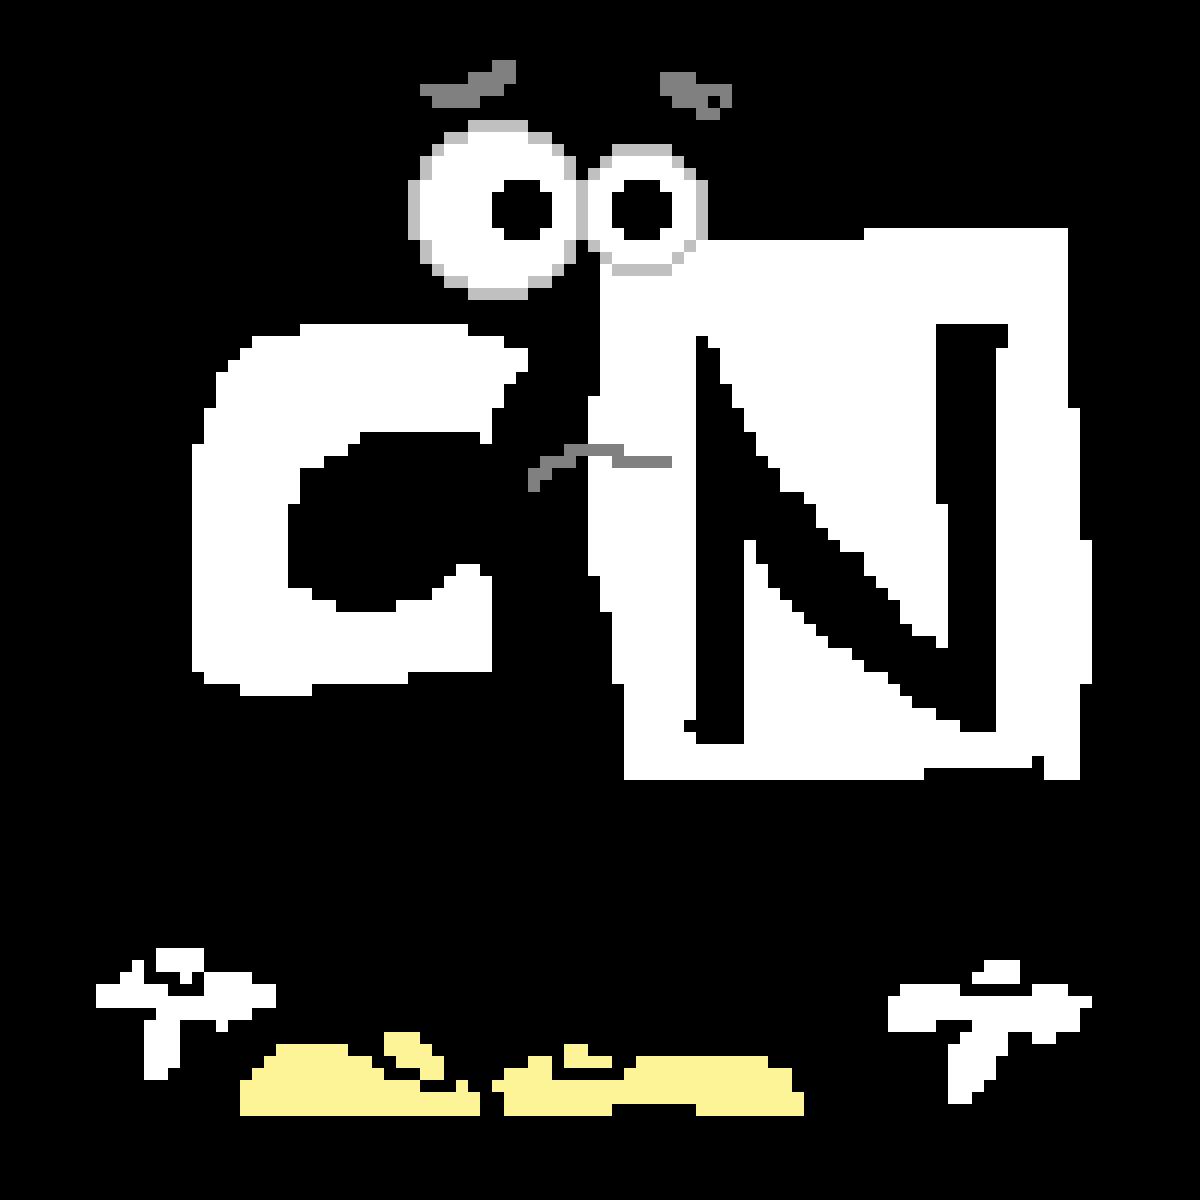 Pixilart Cartoon Network Logo By Ethanimation21